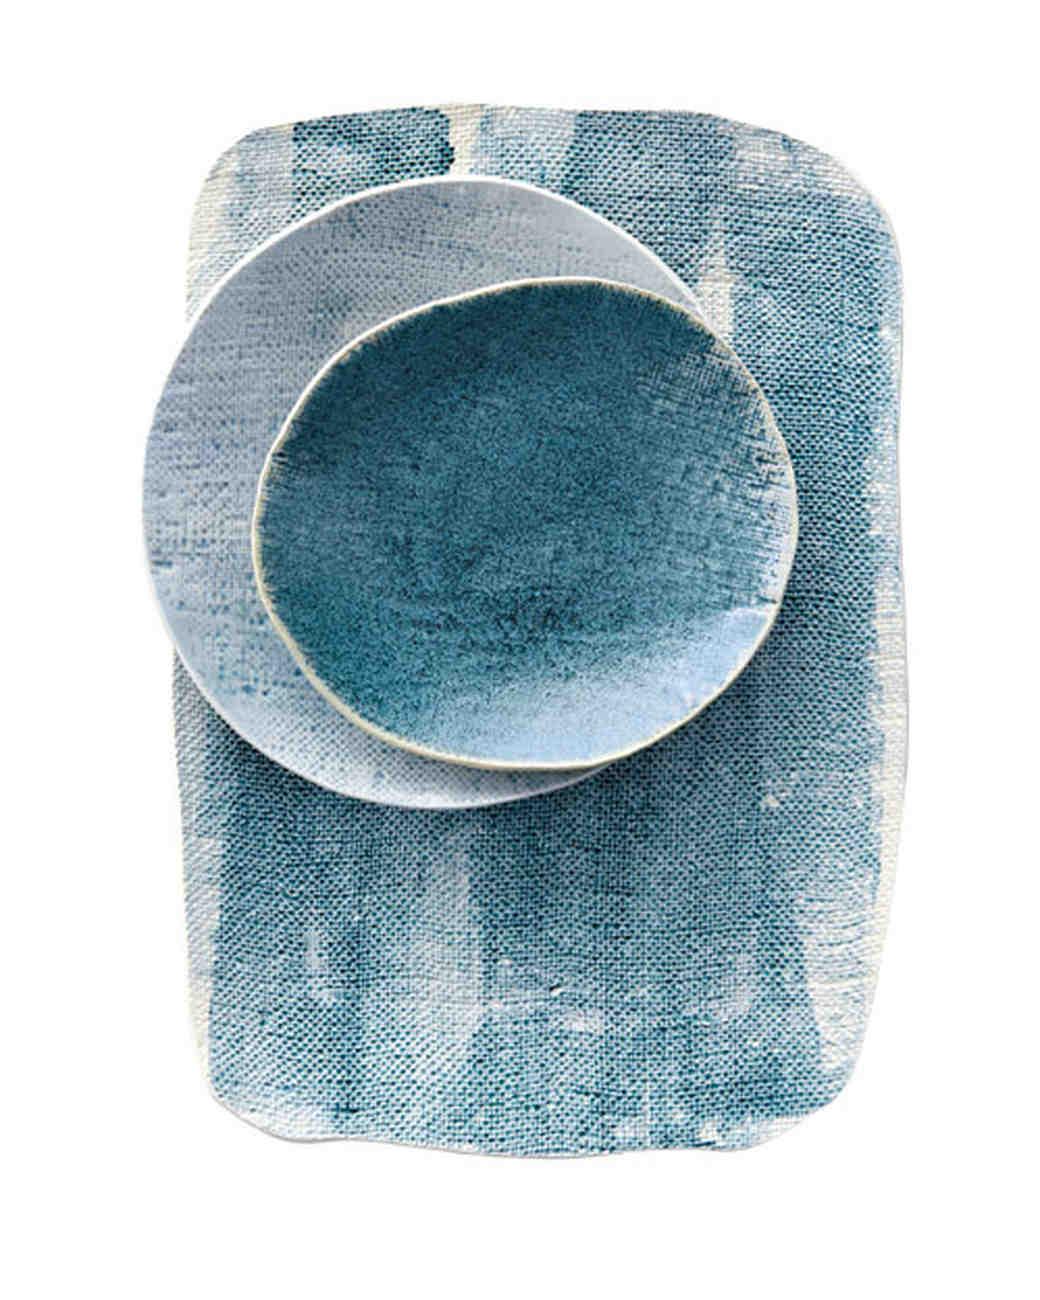 plates_a-sum11mwd107205.jpg